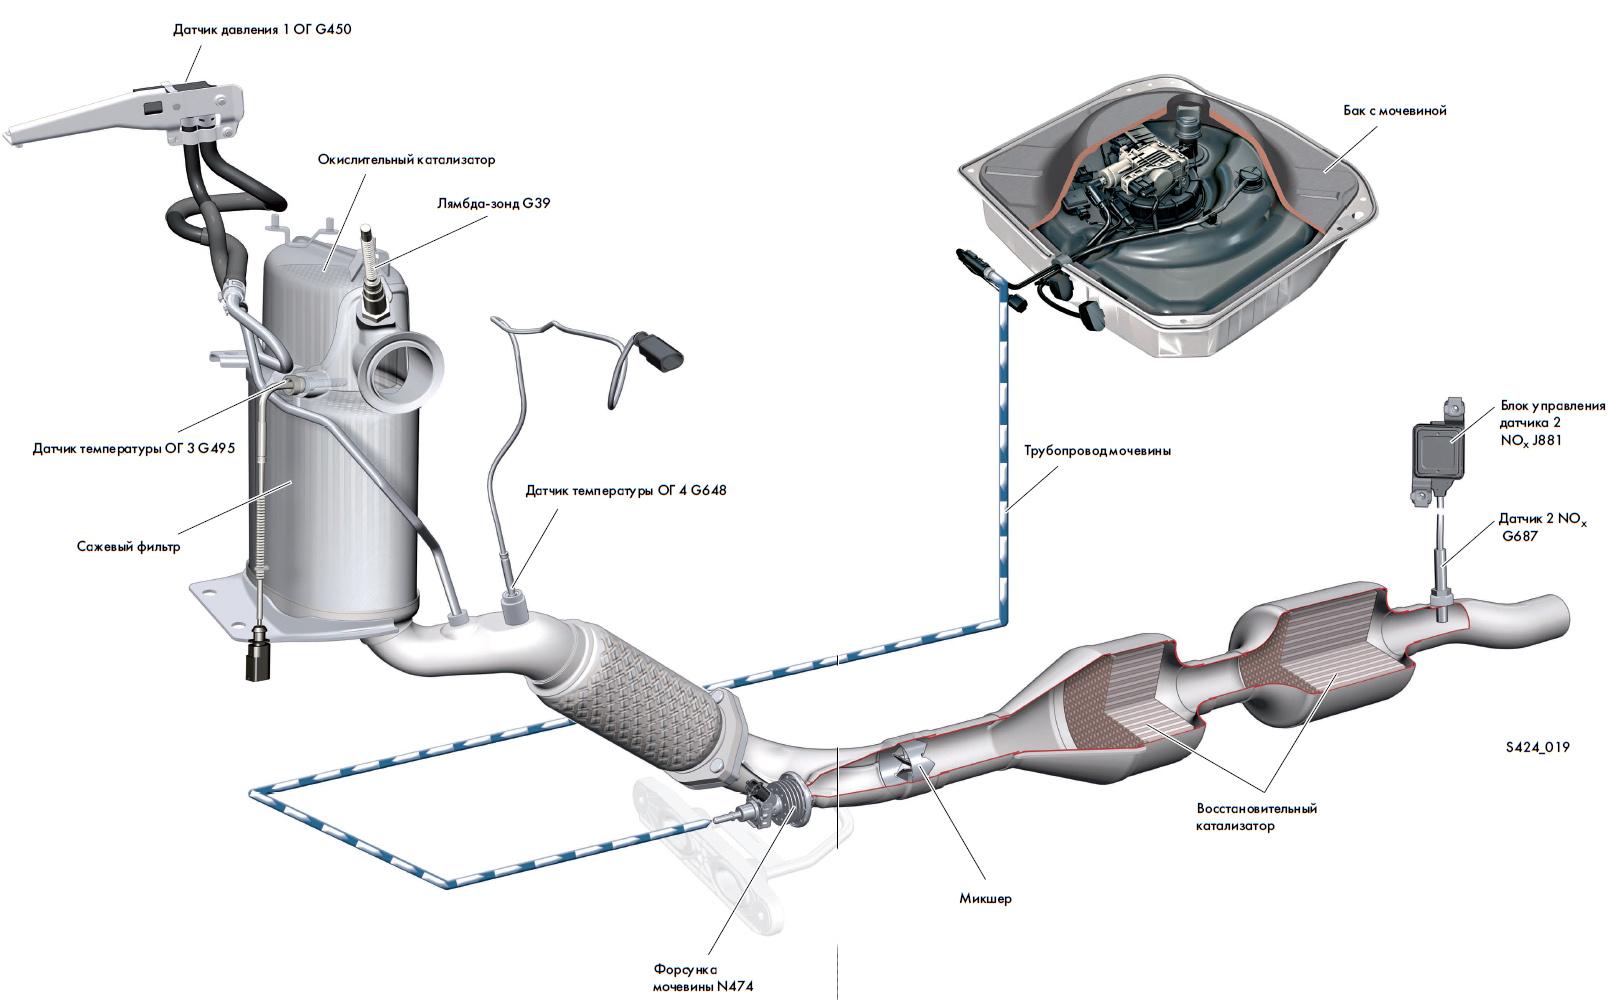 Мочевина для дизелей (грузовиков) euro 4/5/6 характеристики